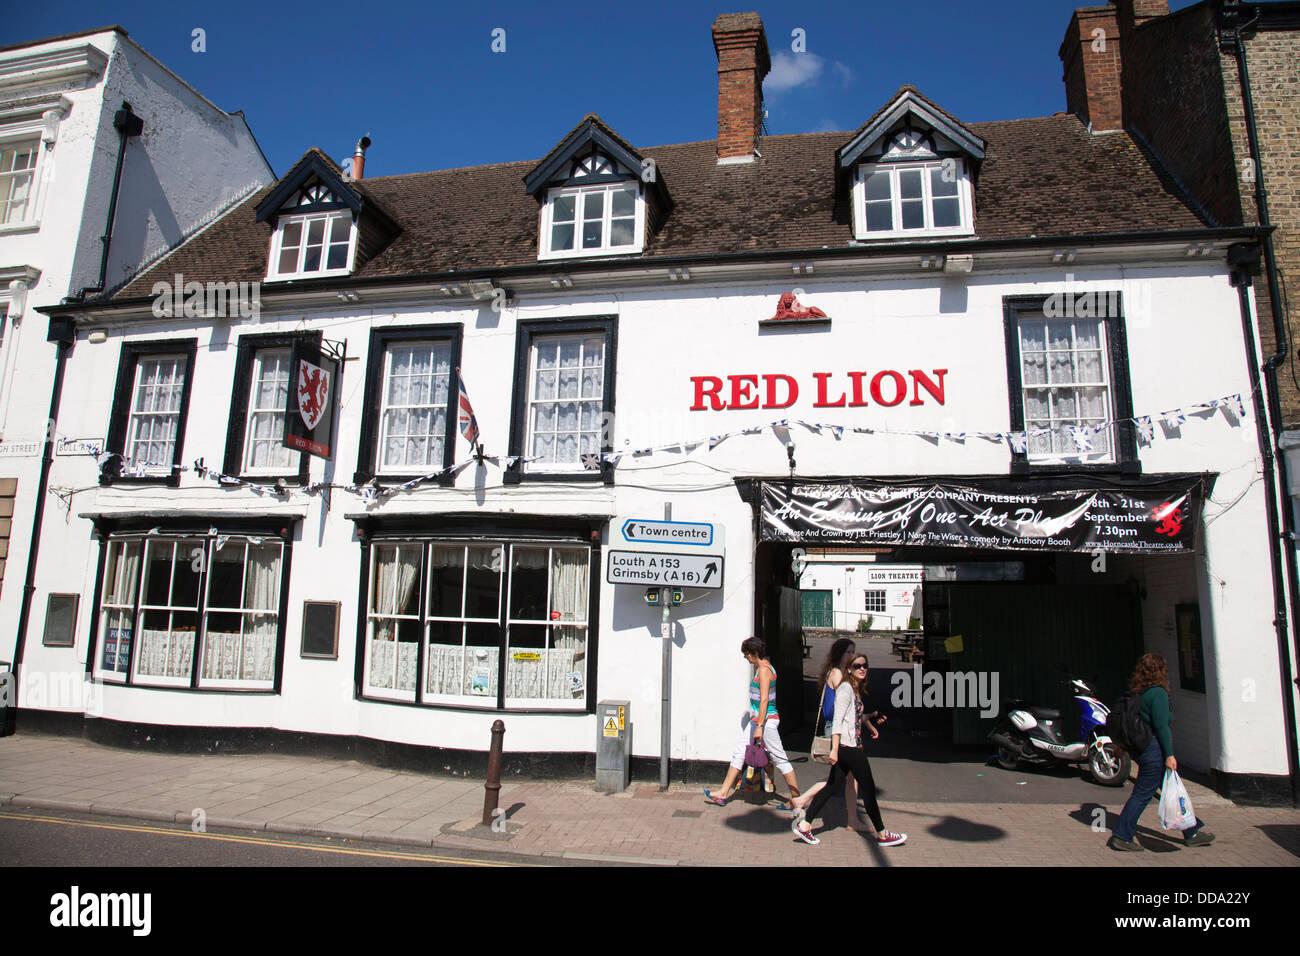 Red lion horncastle